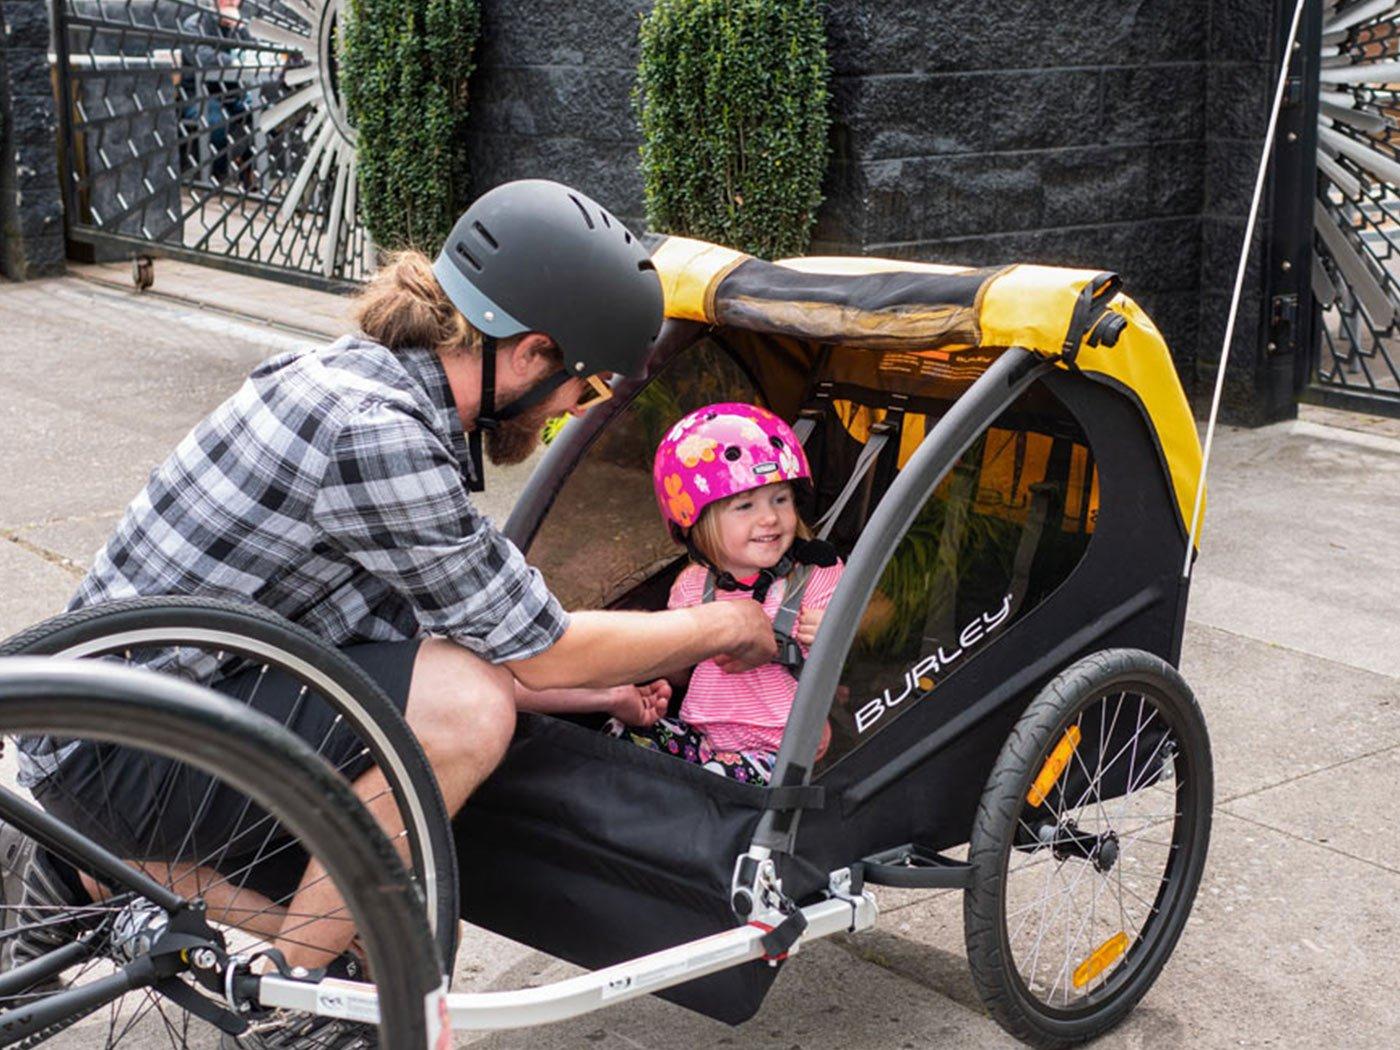 Burley Bee Childrens Bike Trailer at Pembrokeshire Bike Hire